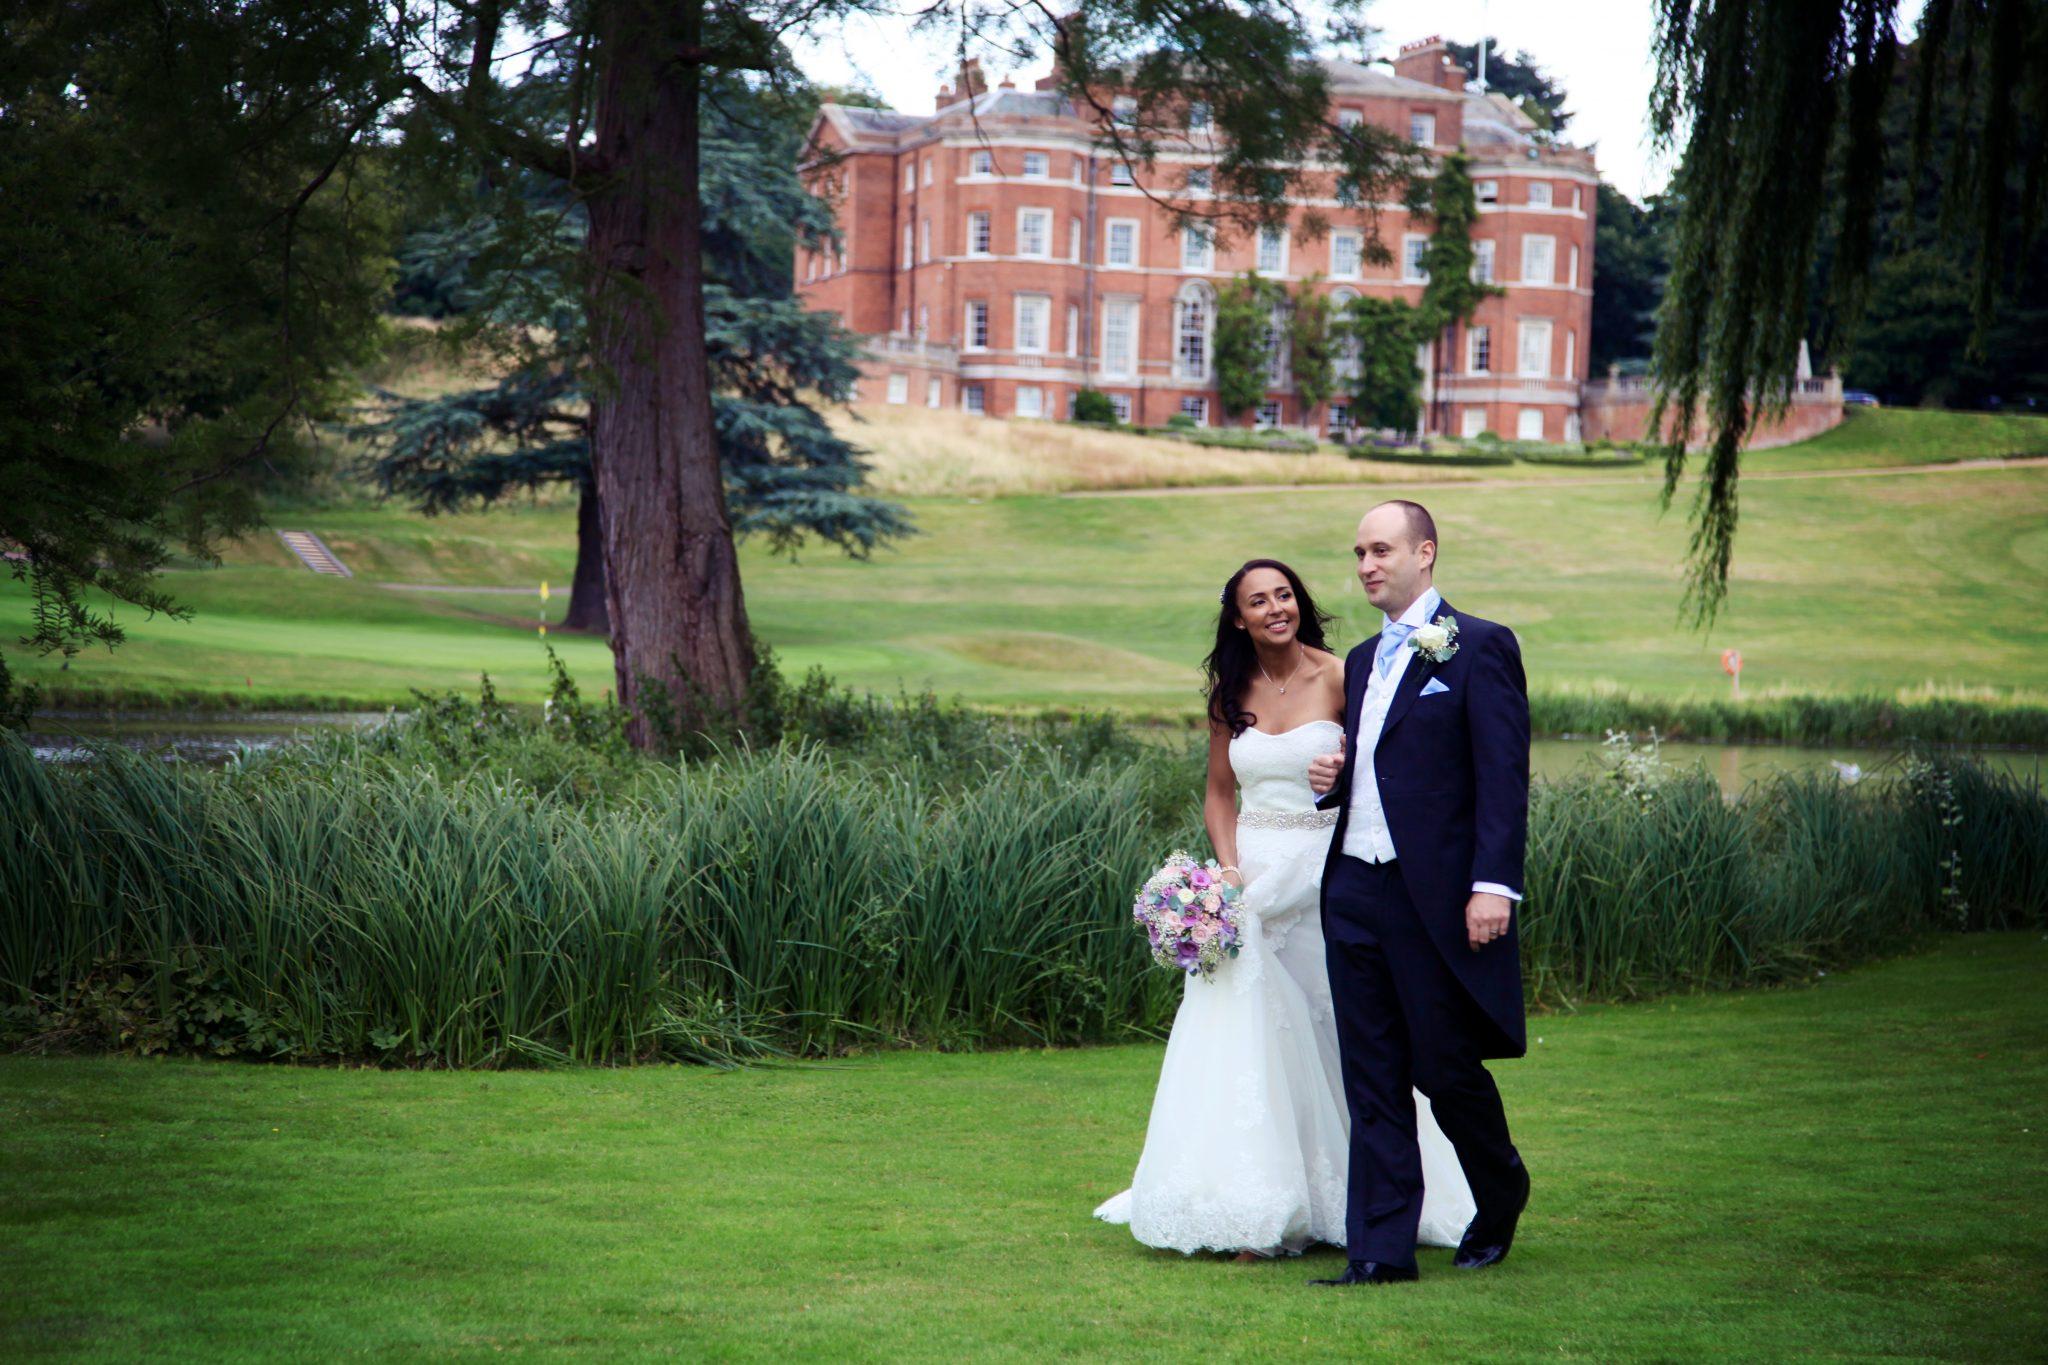 bride and groom at Auberge du Lac, Brocket Hall